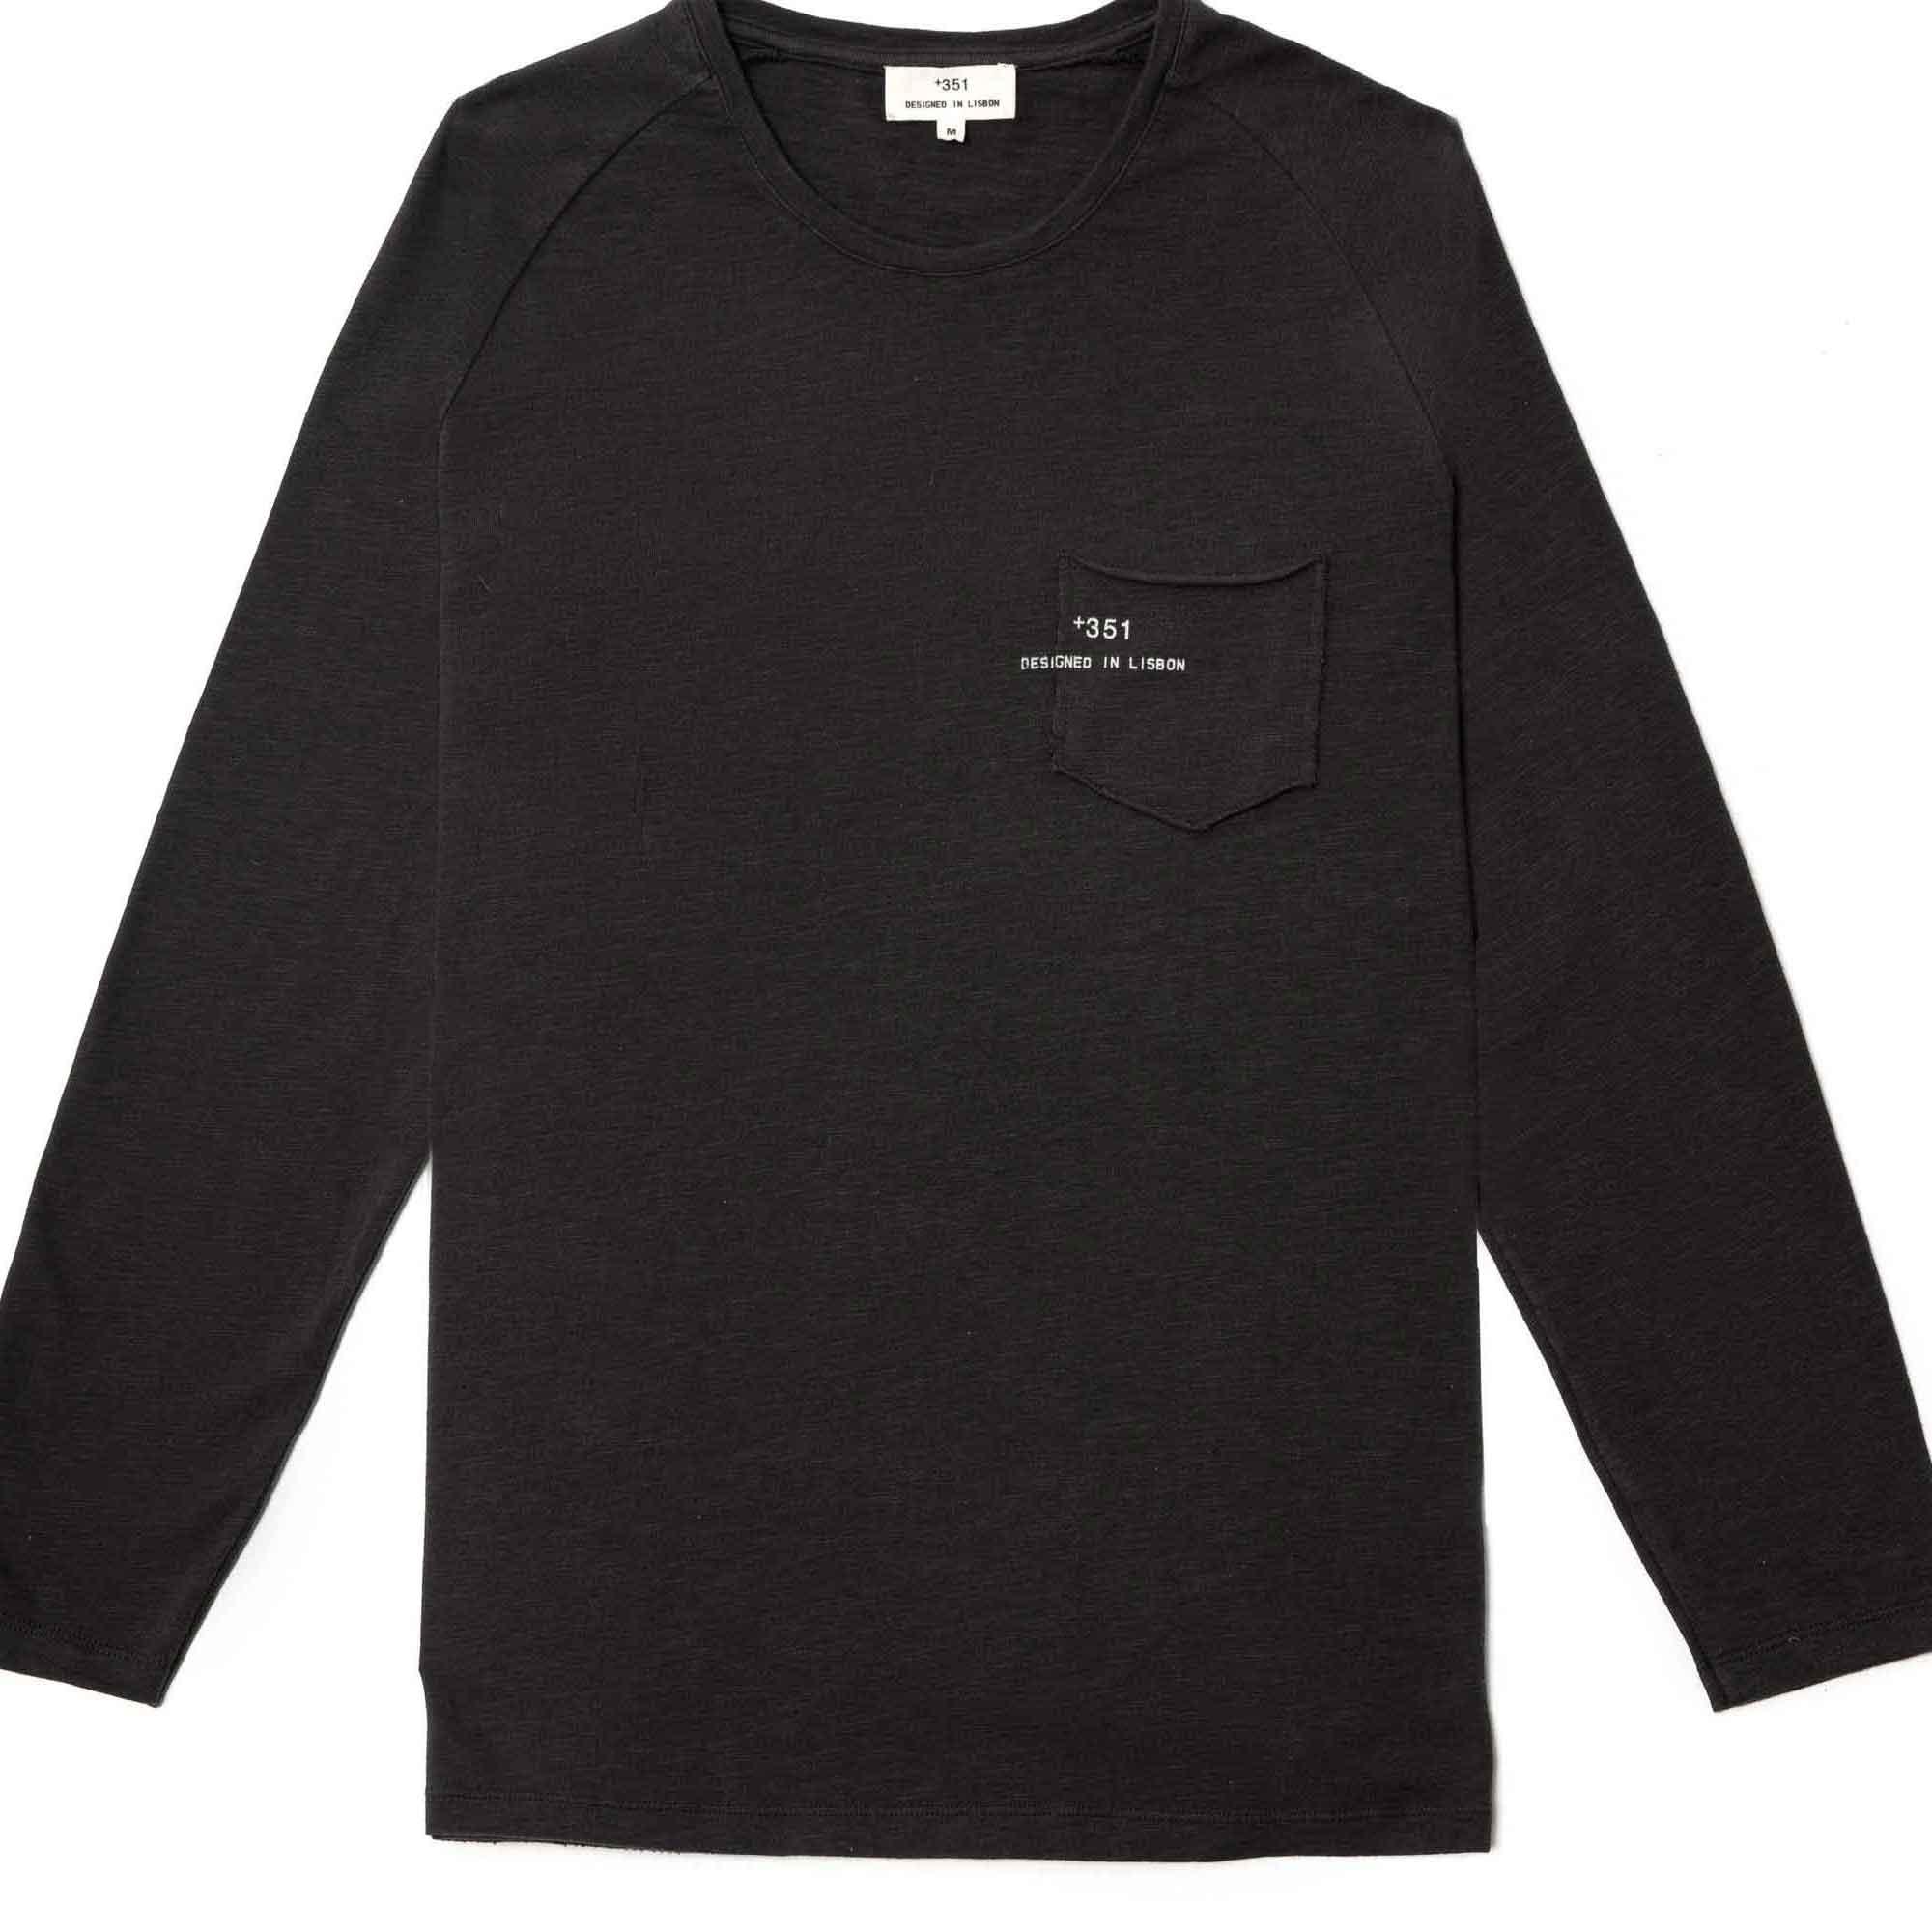 Sudadera manga larga negra con logo